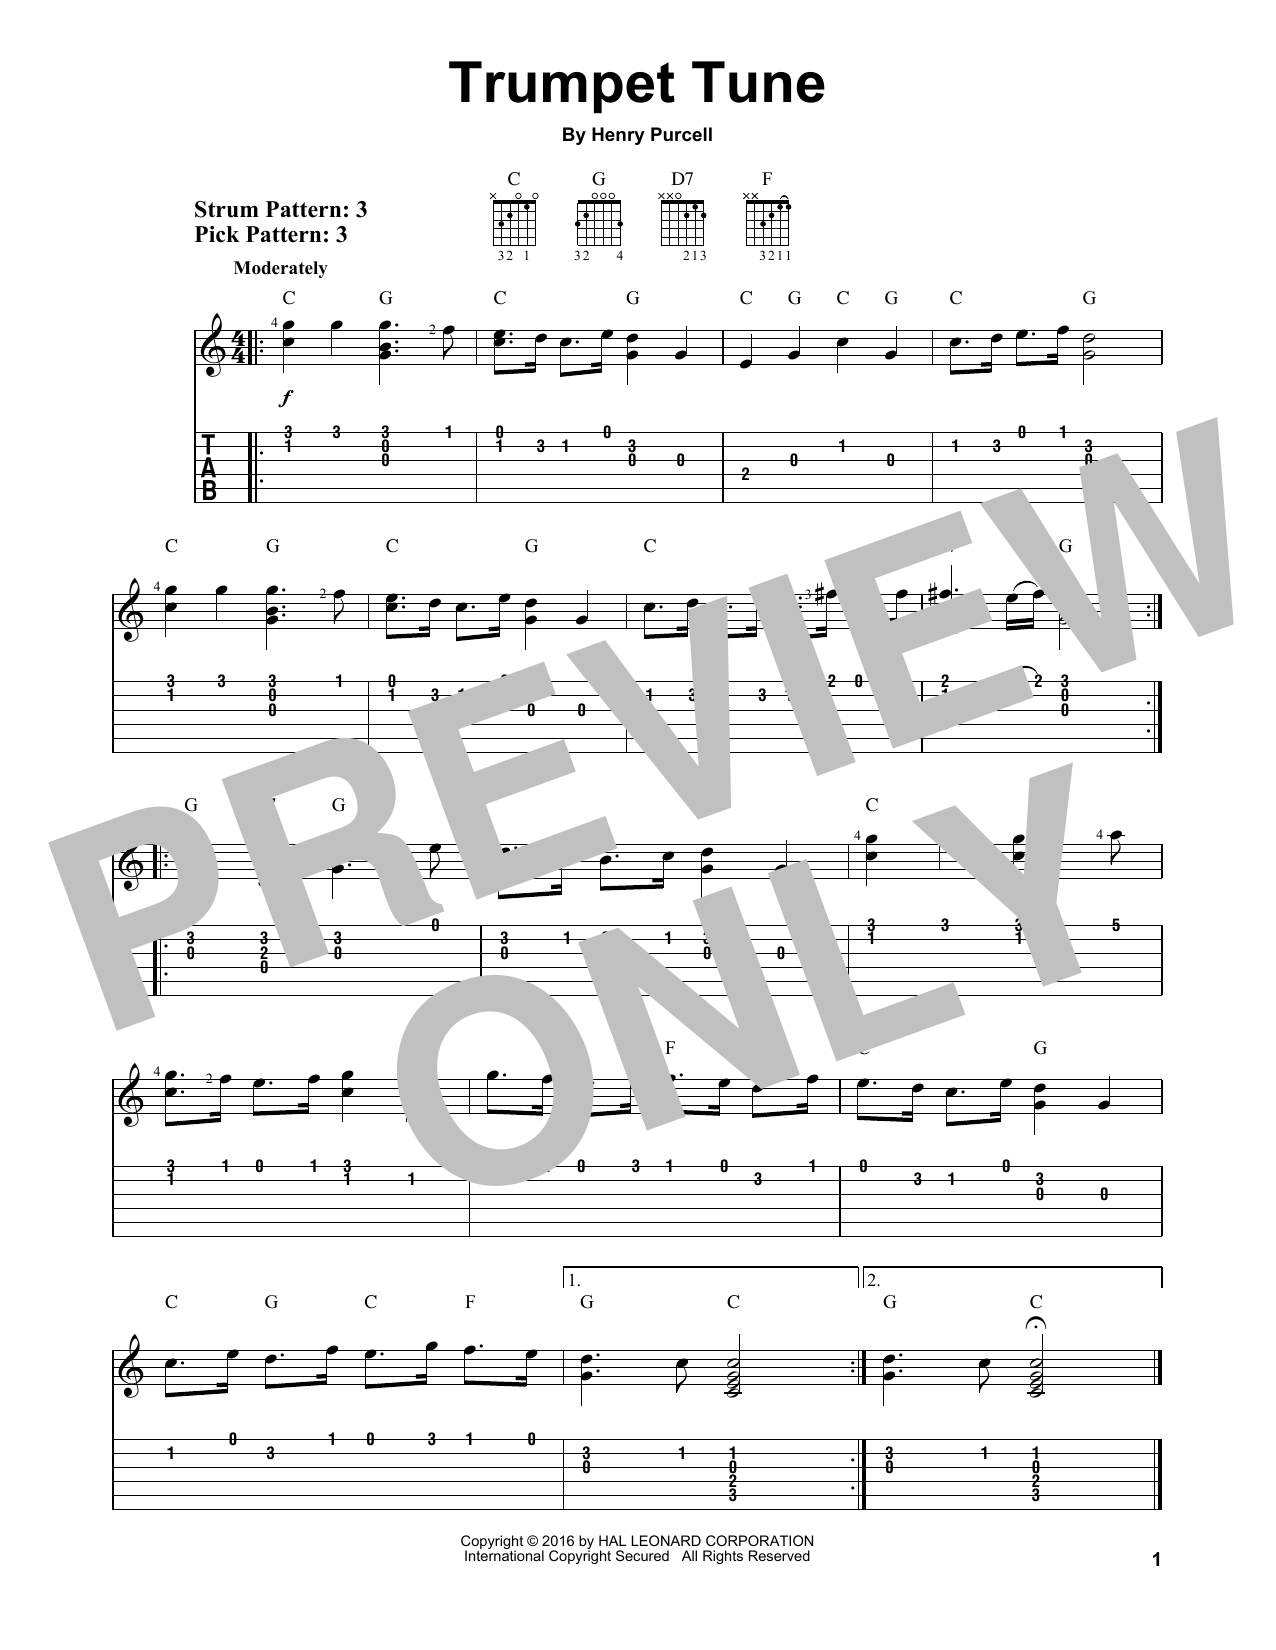 Trumpet Tune Sheet Music